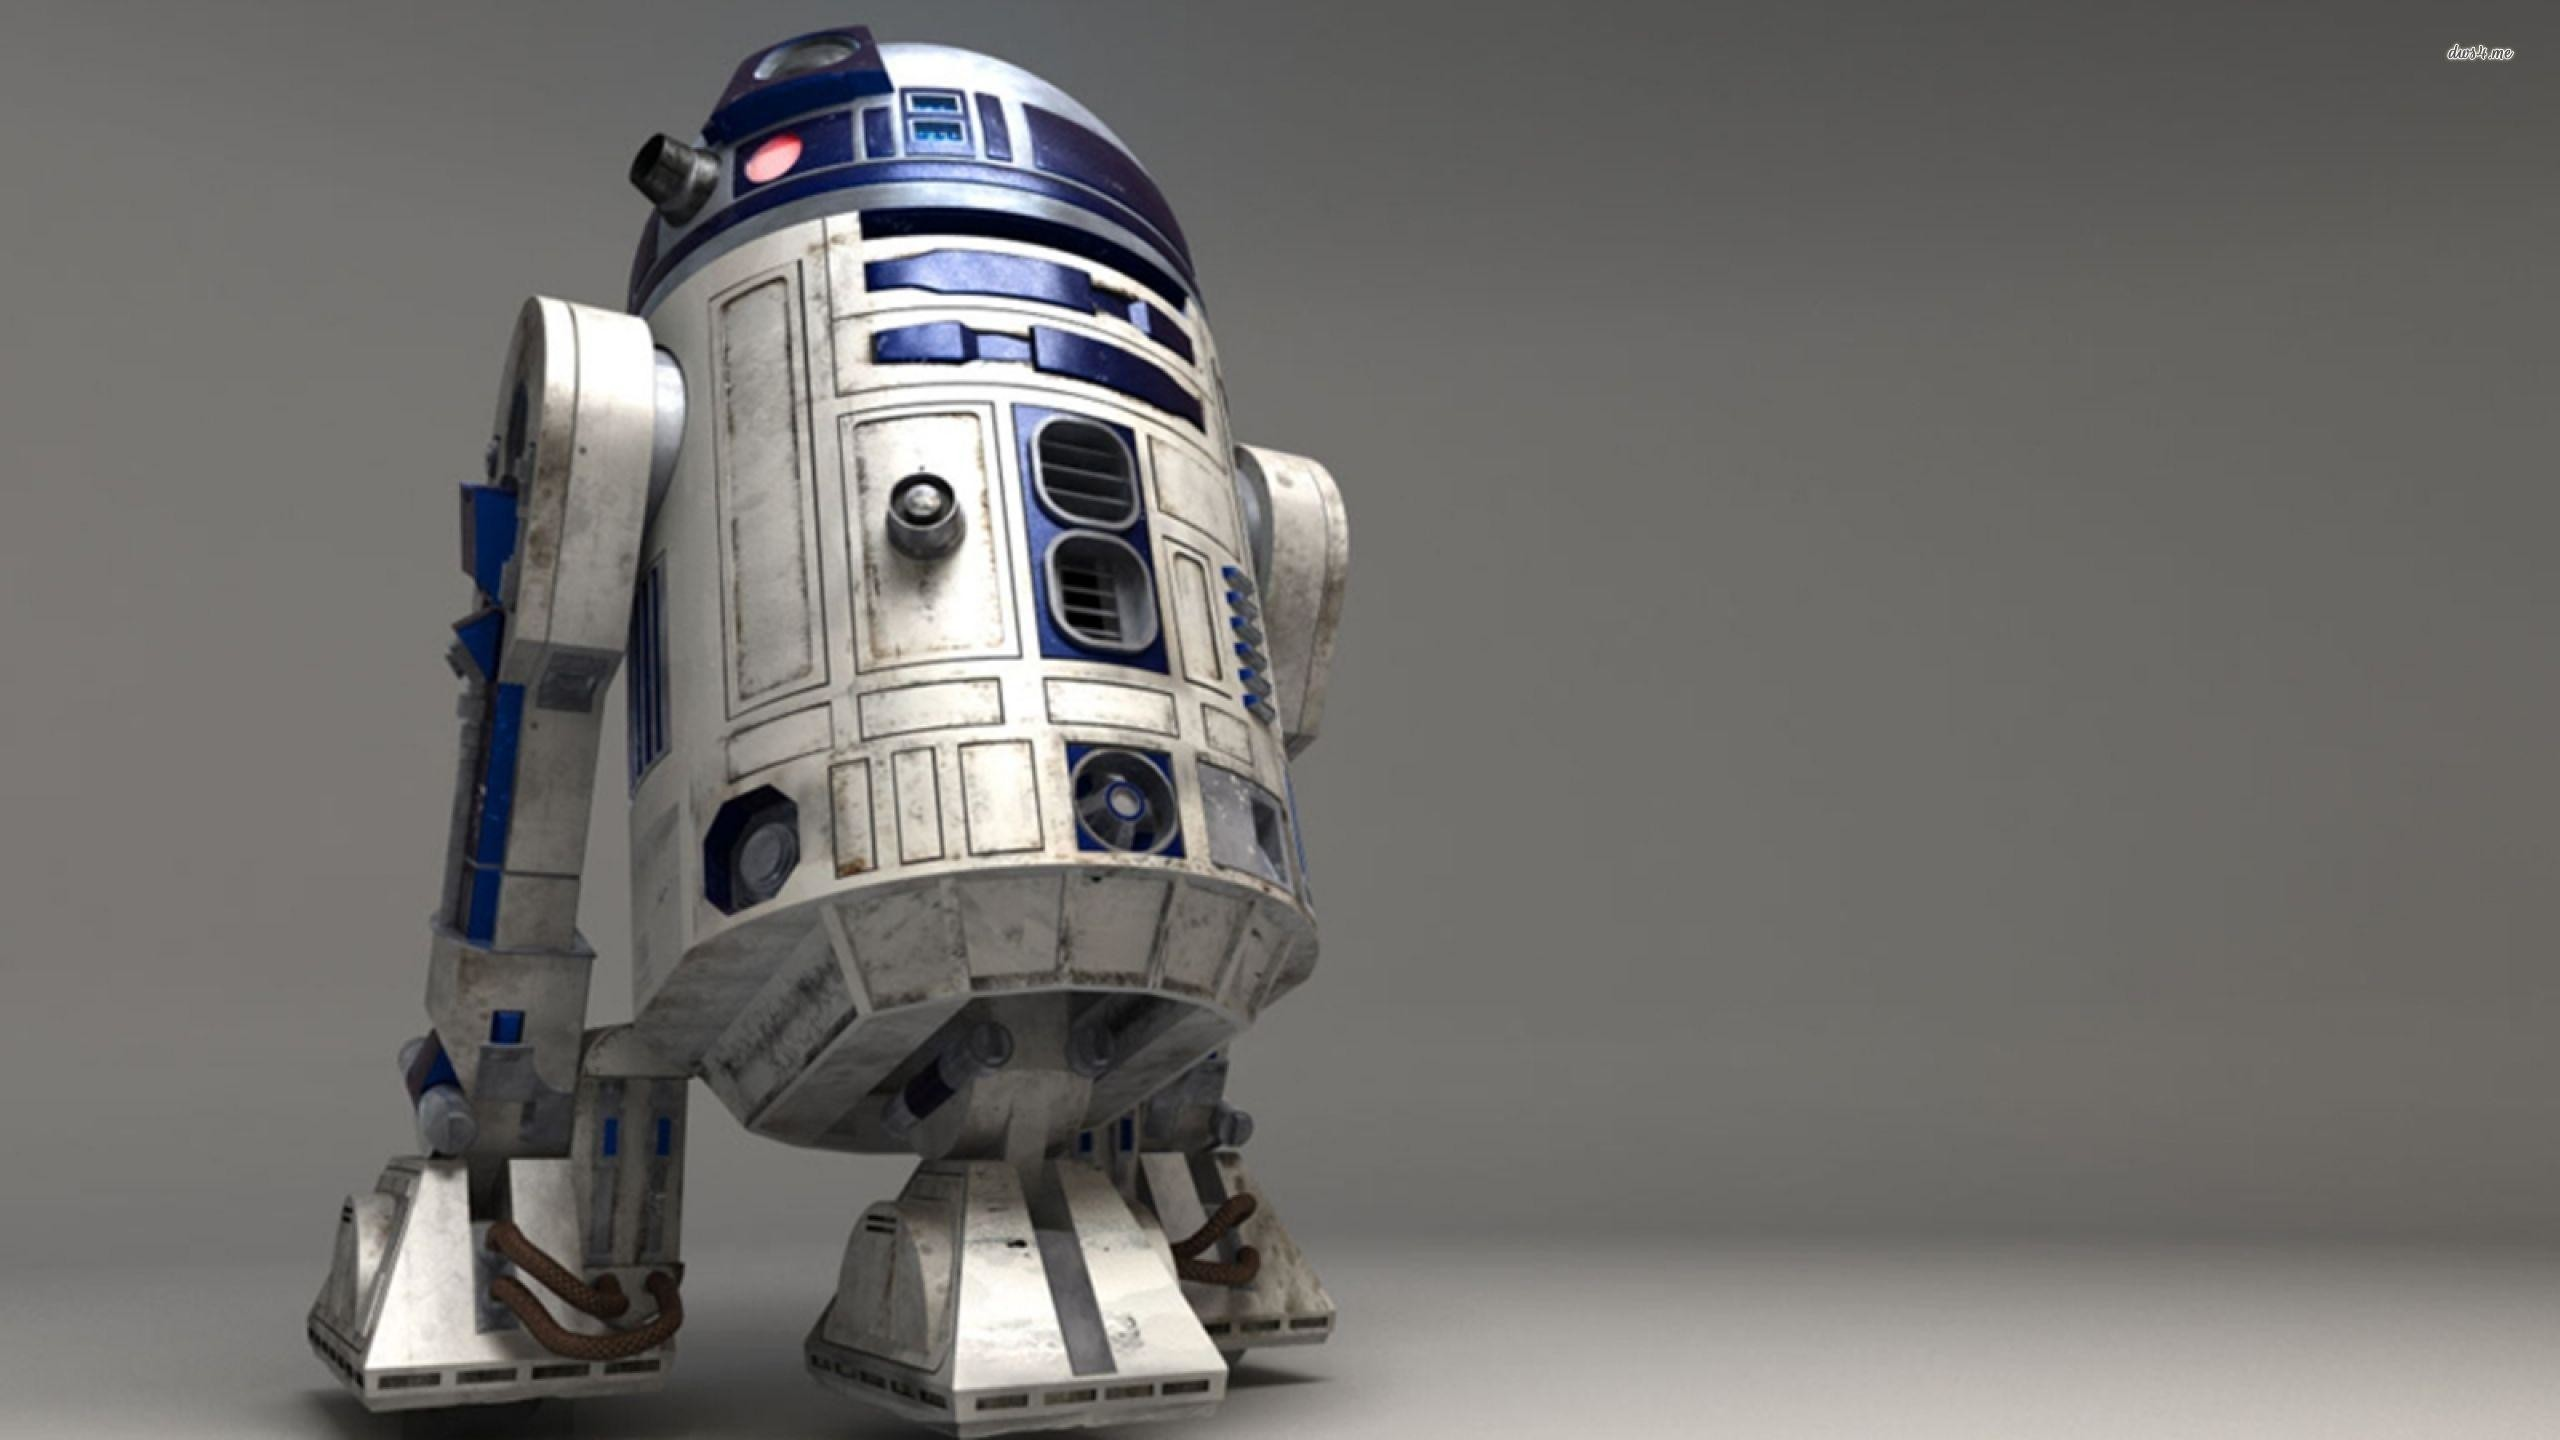 R2-D2 wallpaper – Digital Art wallpapers – #